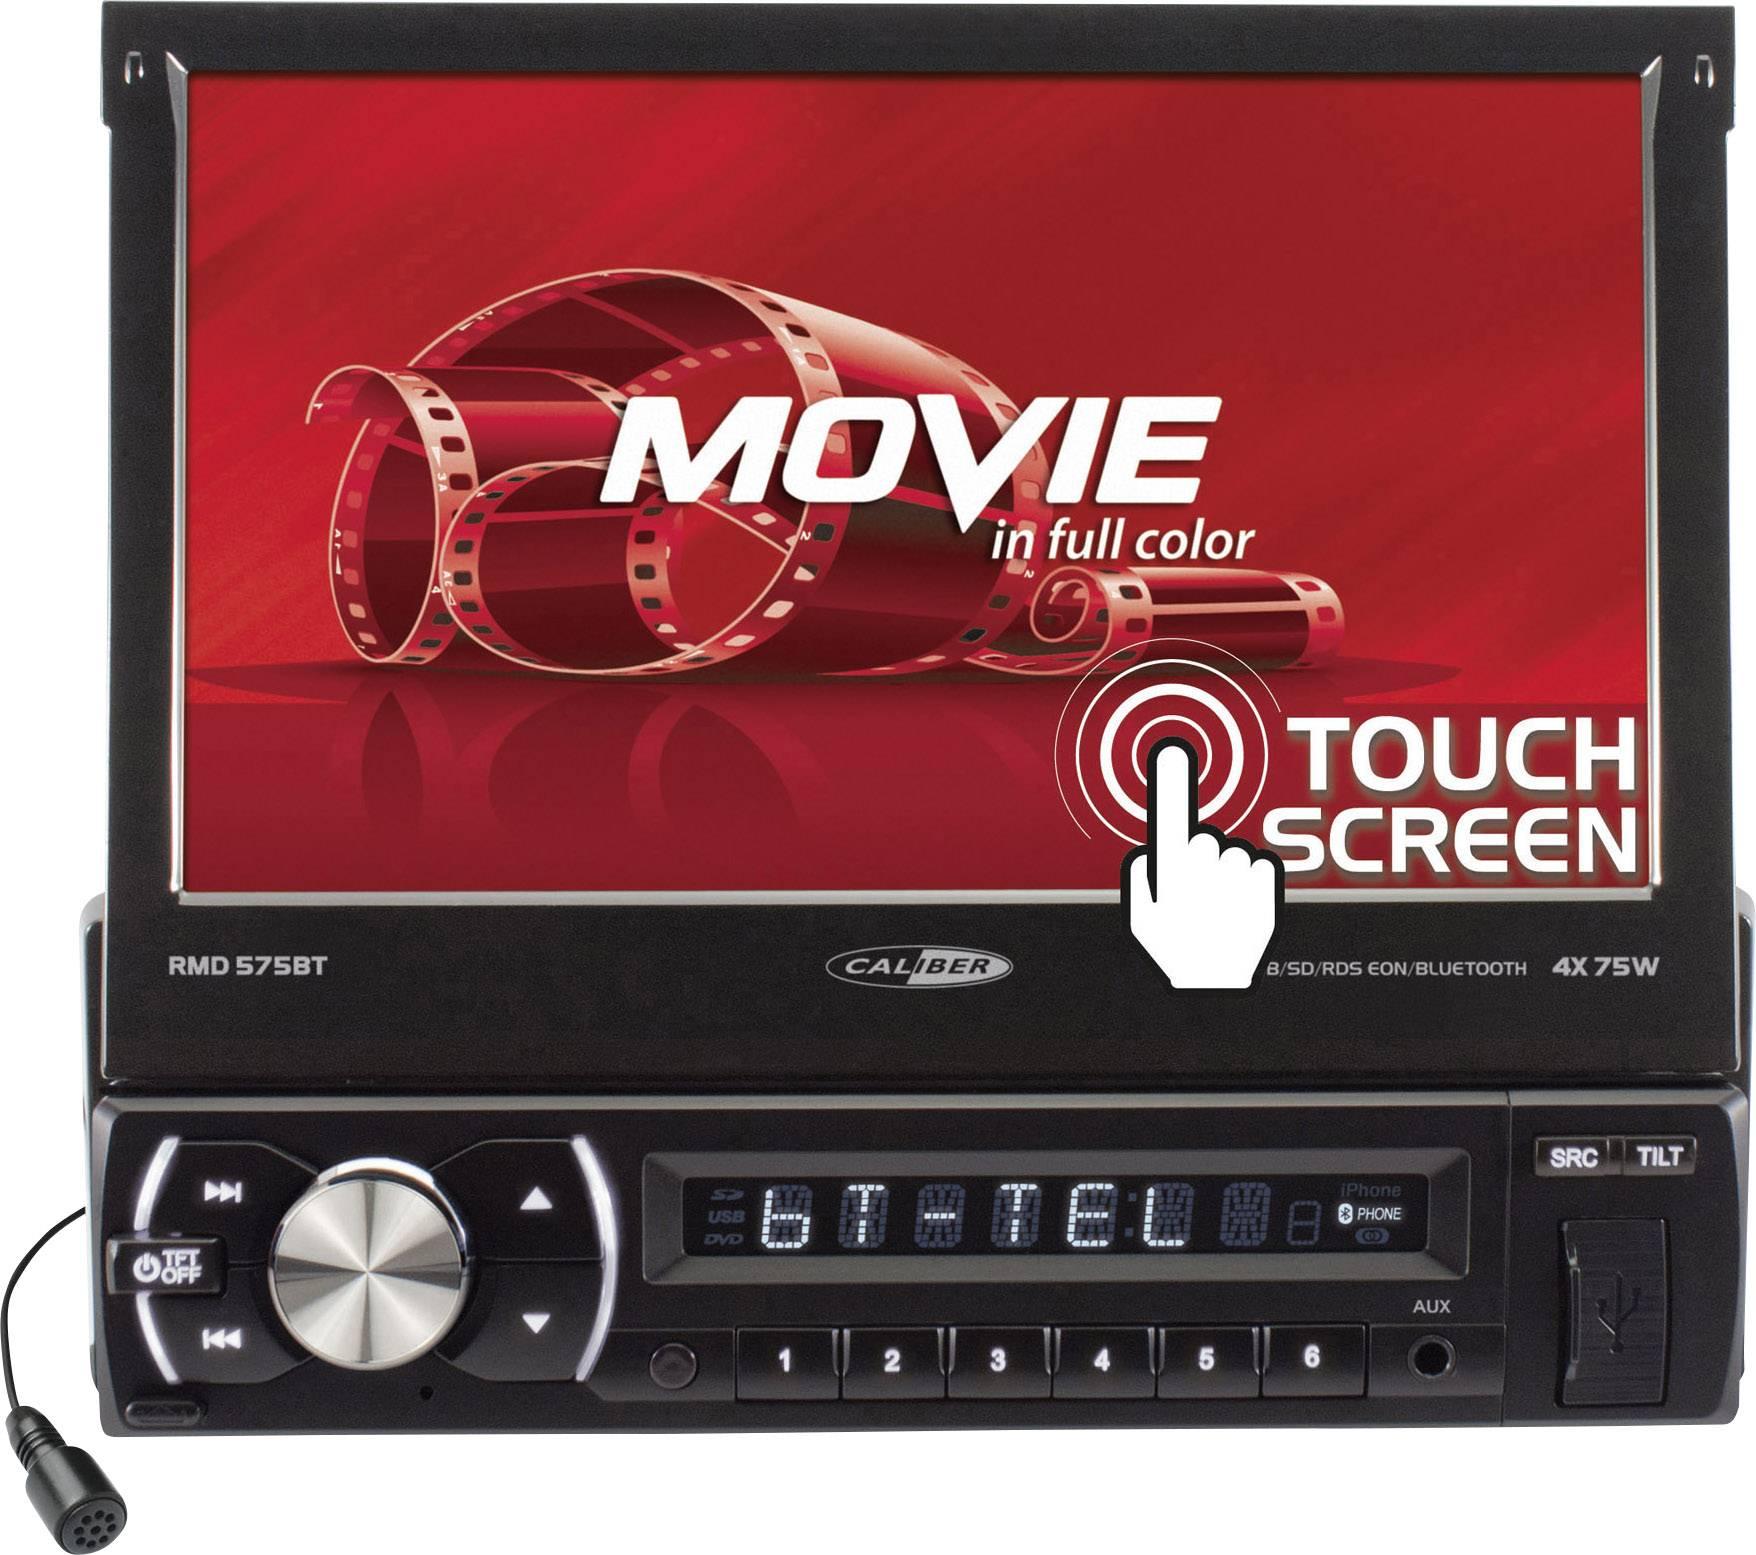 Multimediálny prehrávač Caliber Audio Technology RMD-575BT, s Bluetooth